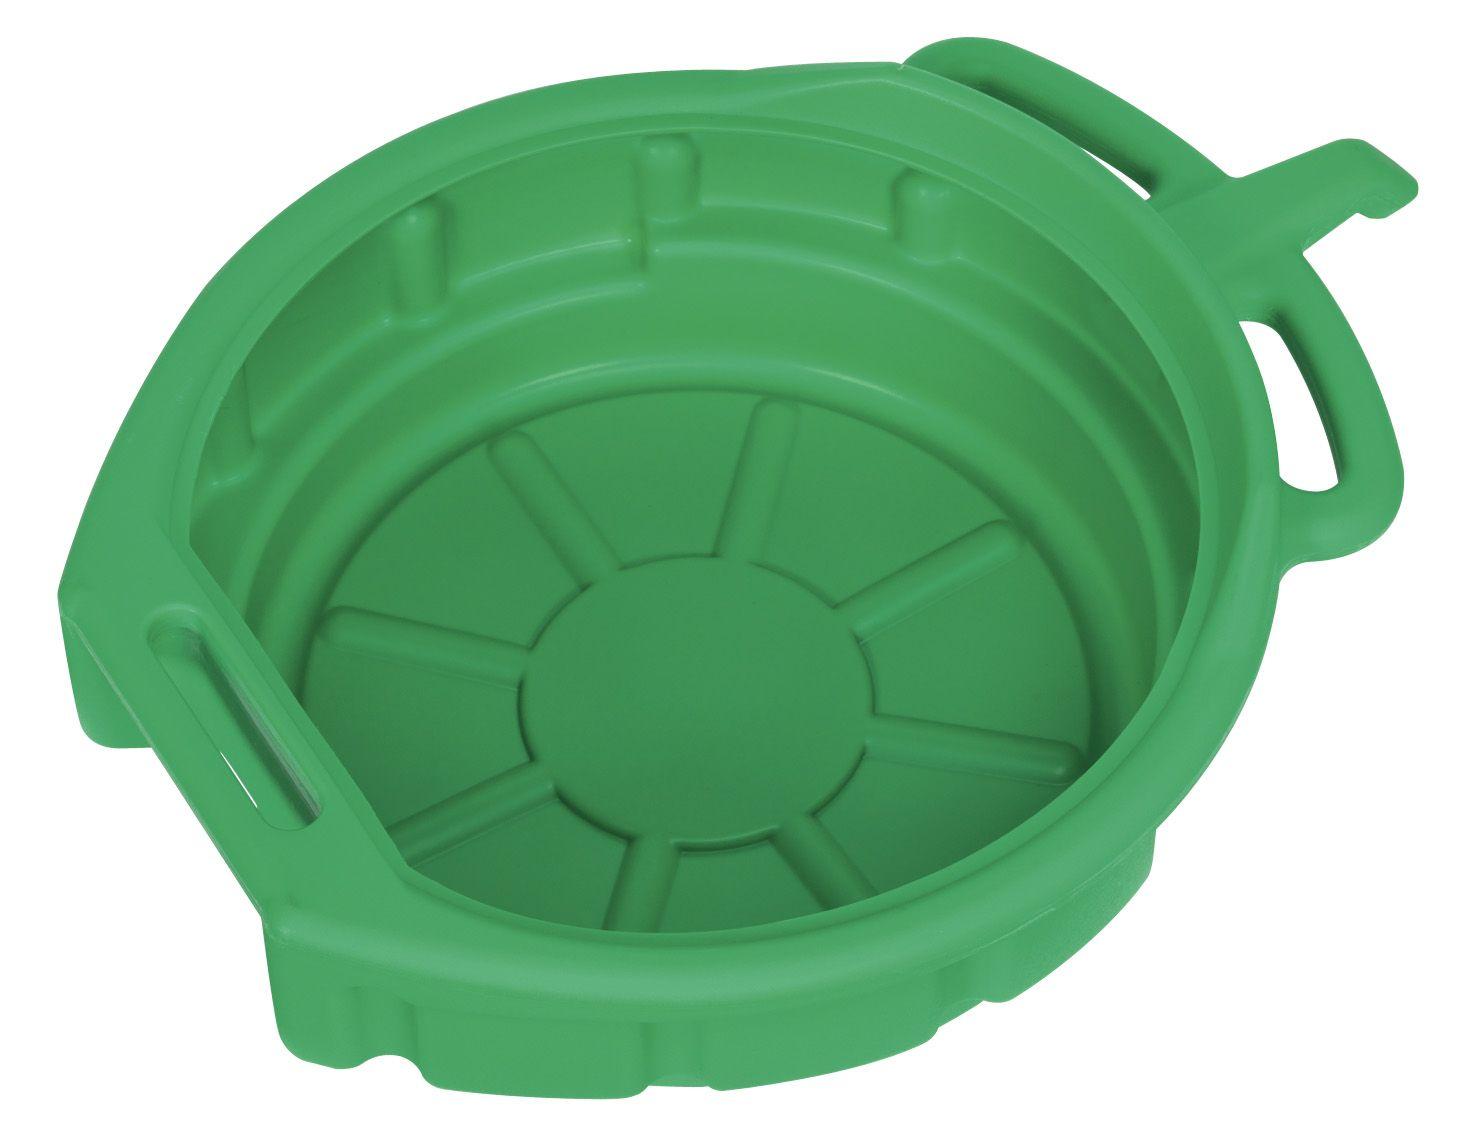 Sealey Antifreeze/Fluid Drain Pan 17L